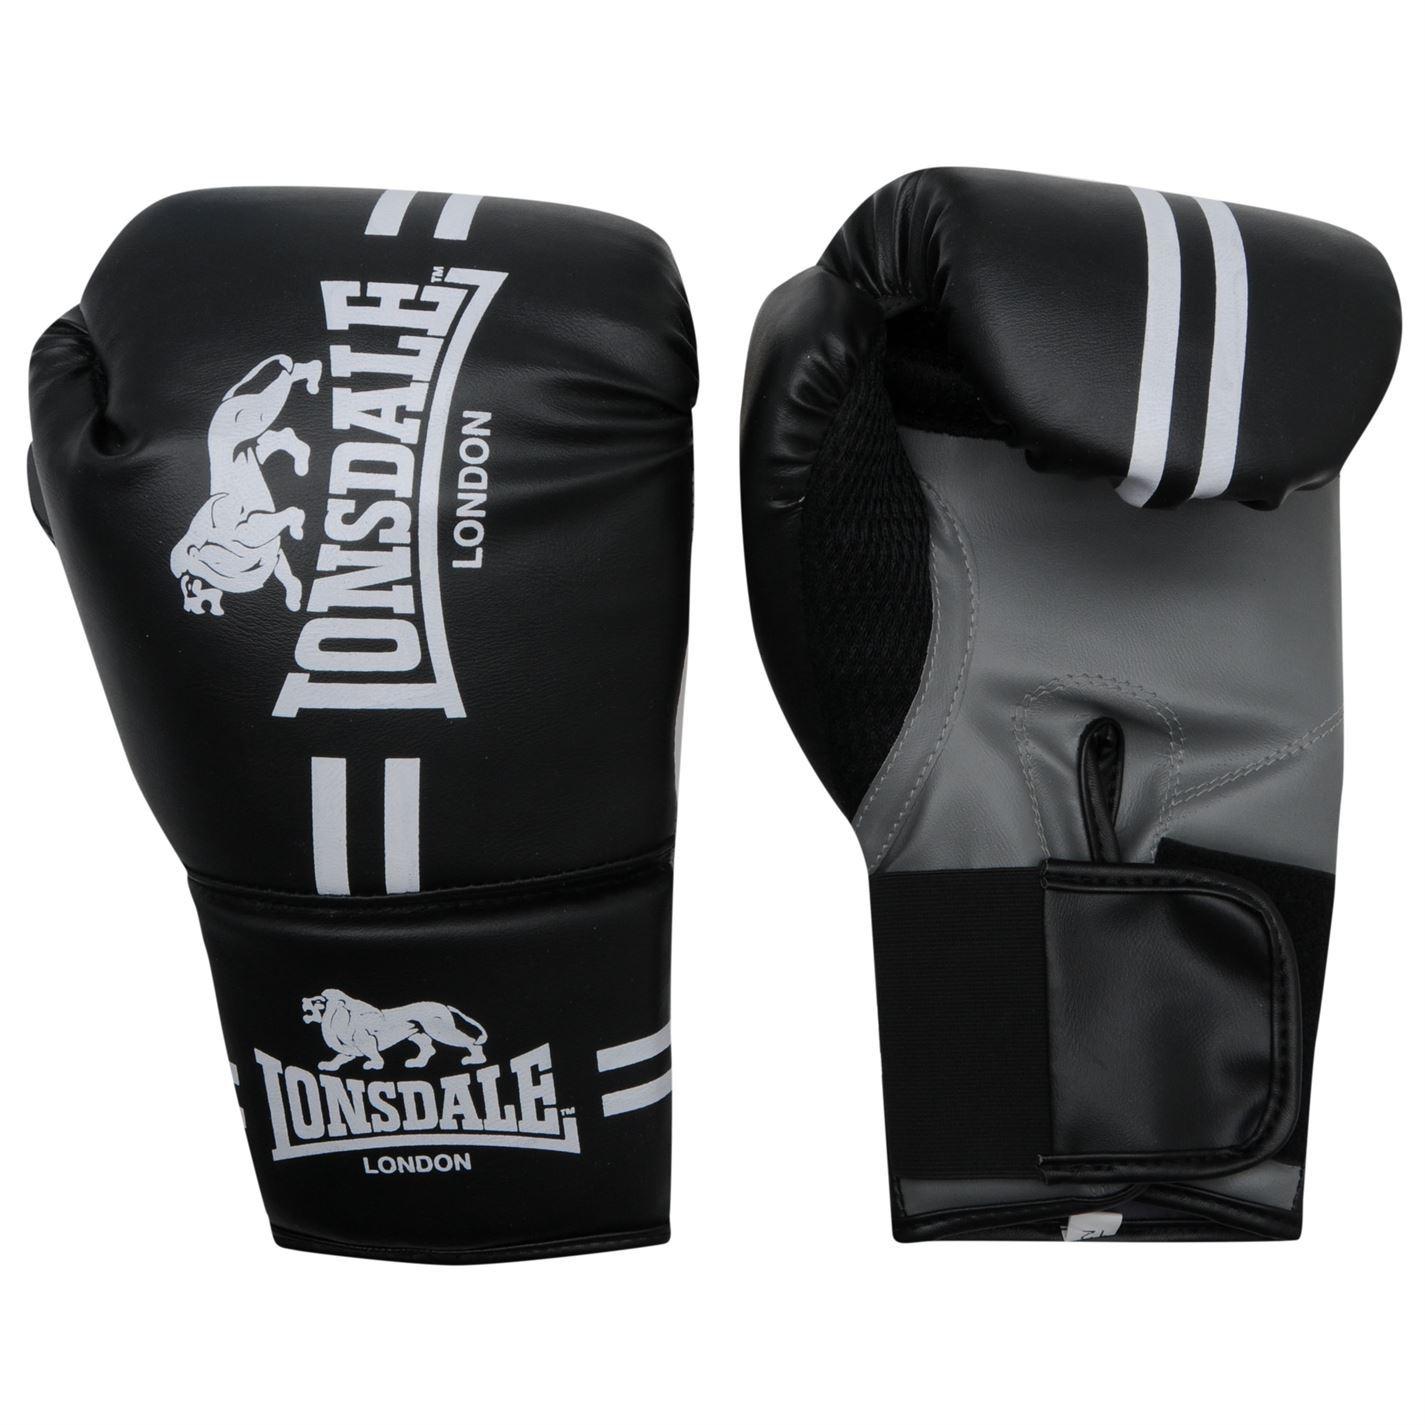 Lonsdale London Contender Bag Mitts Black//White Boxing Gloves Fitness Training